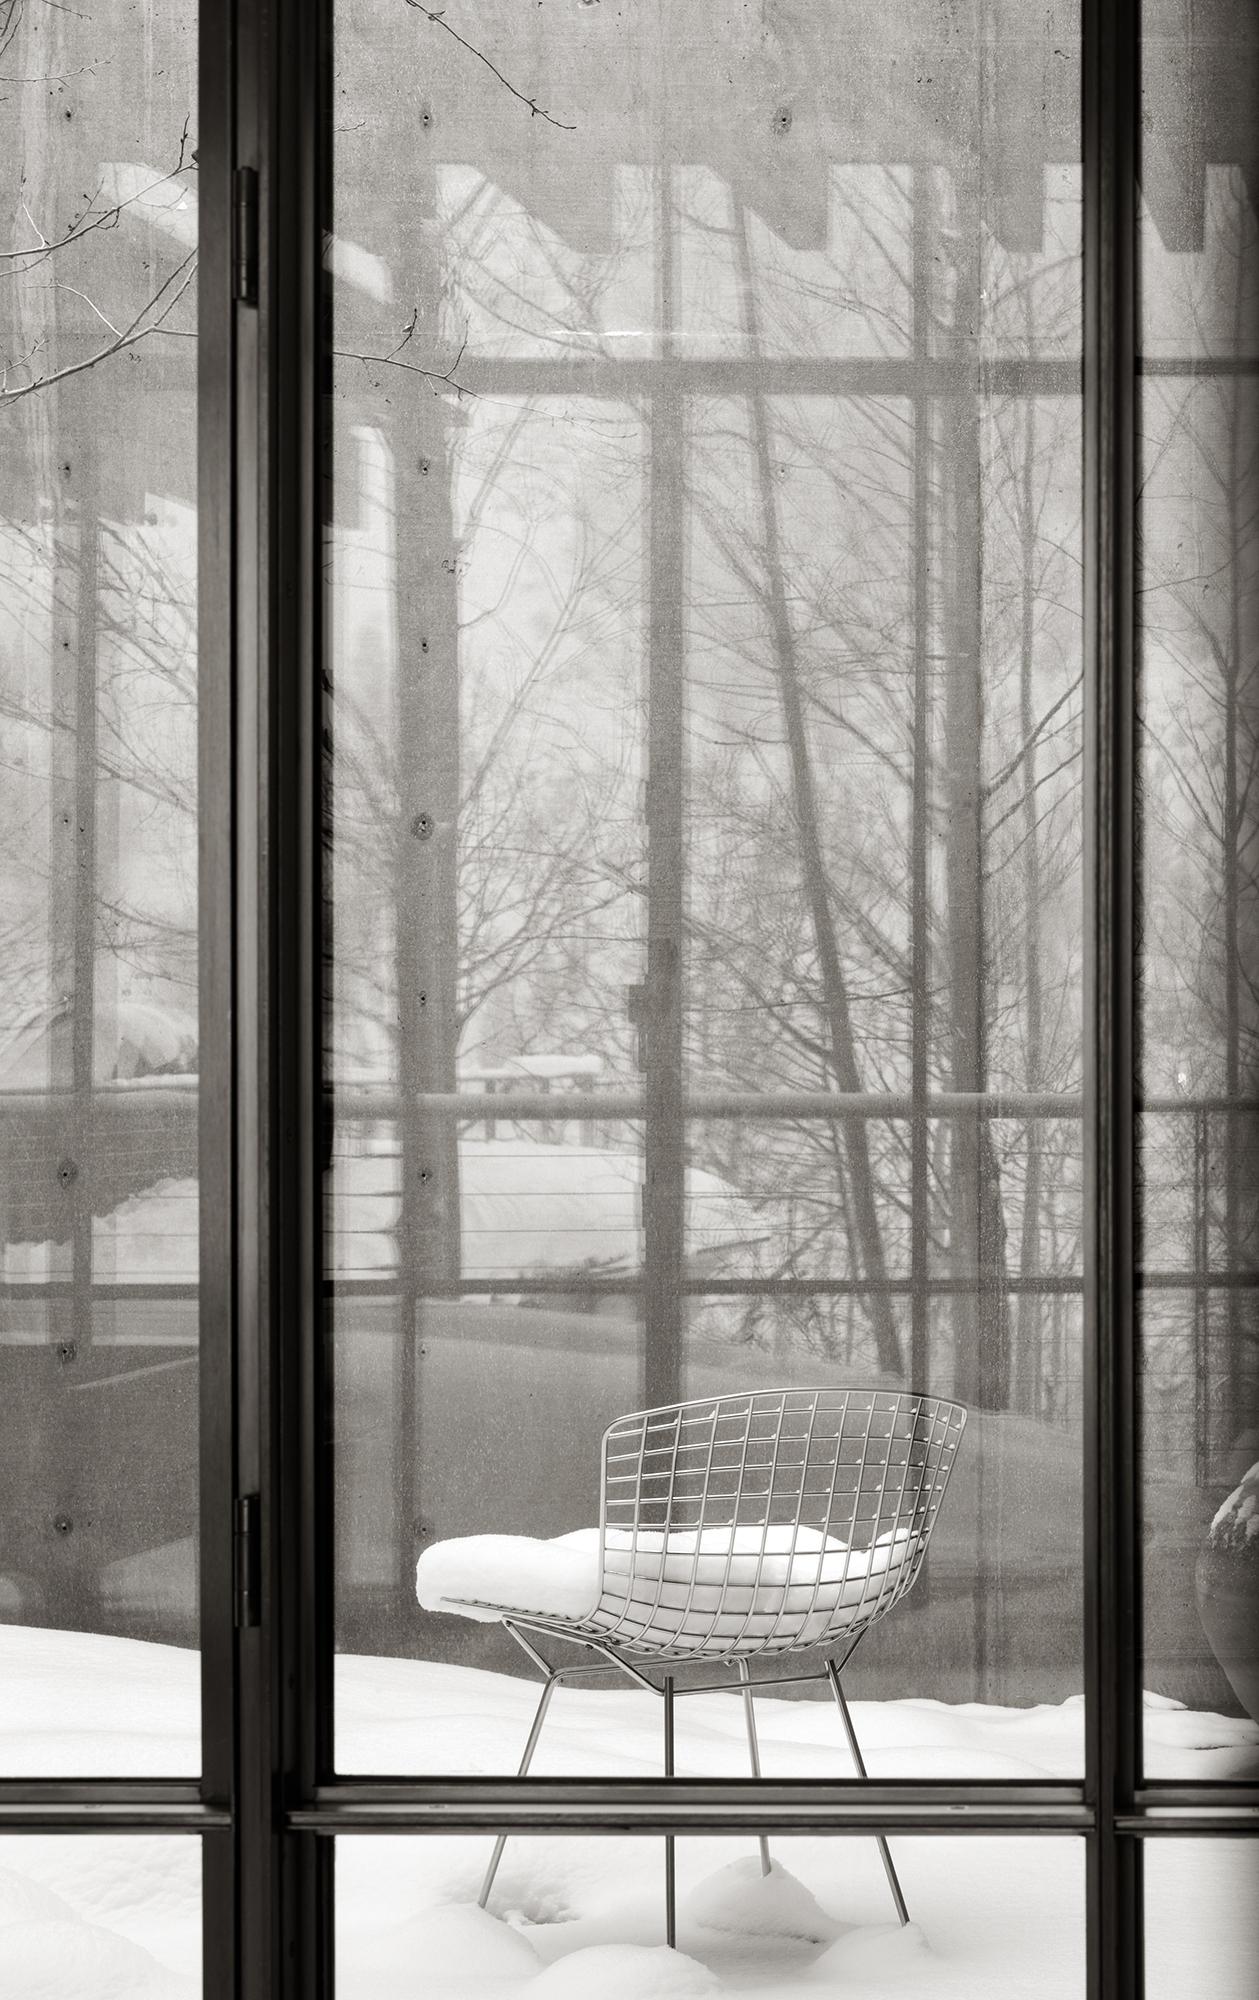 renzo piano building workshop | pritzker residence | aspen usa